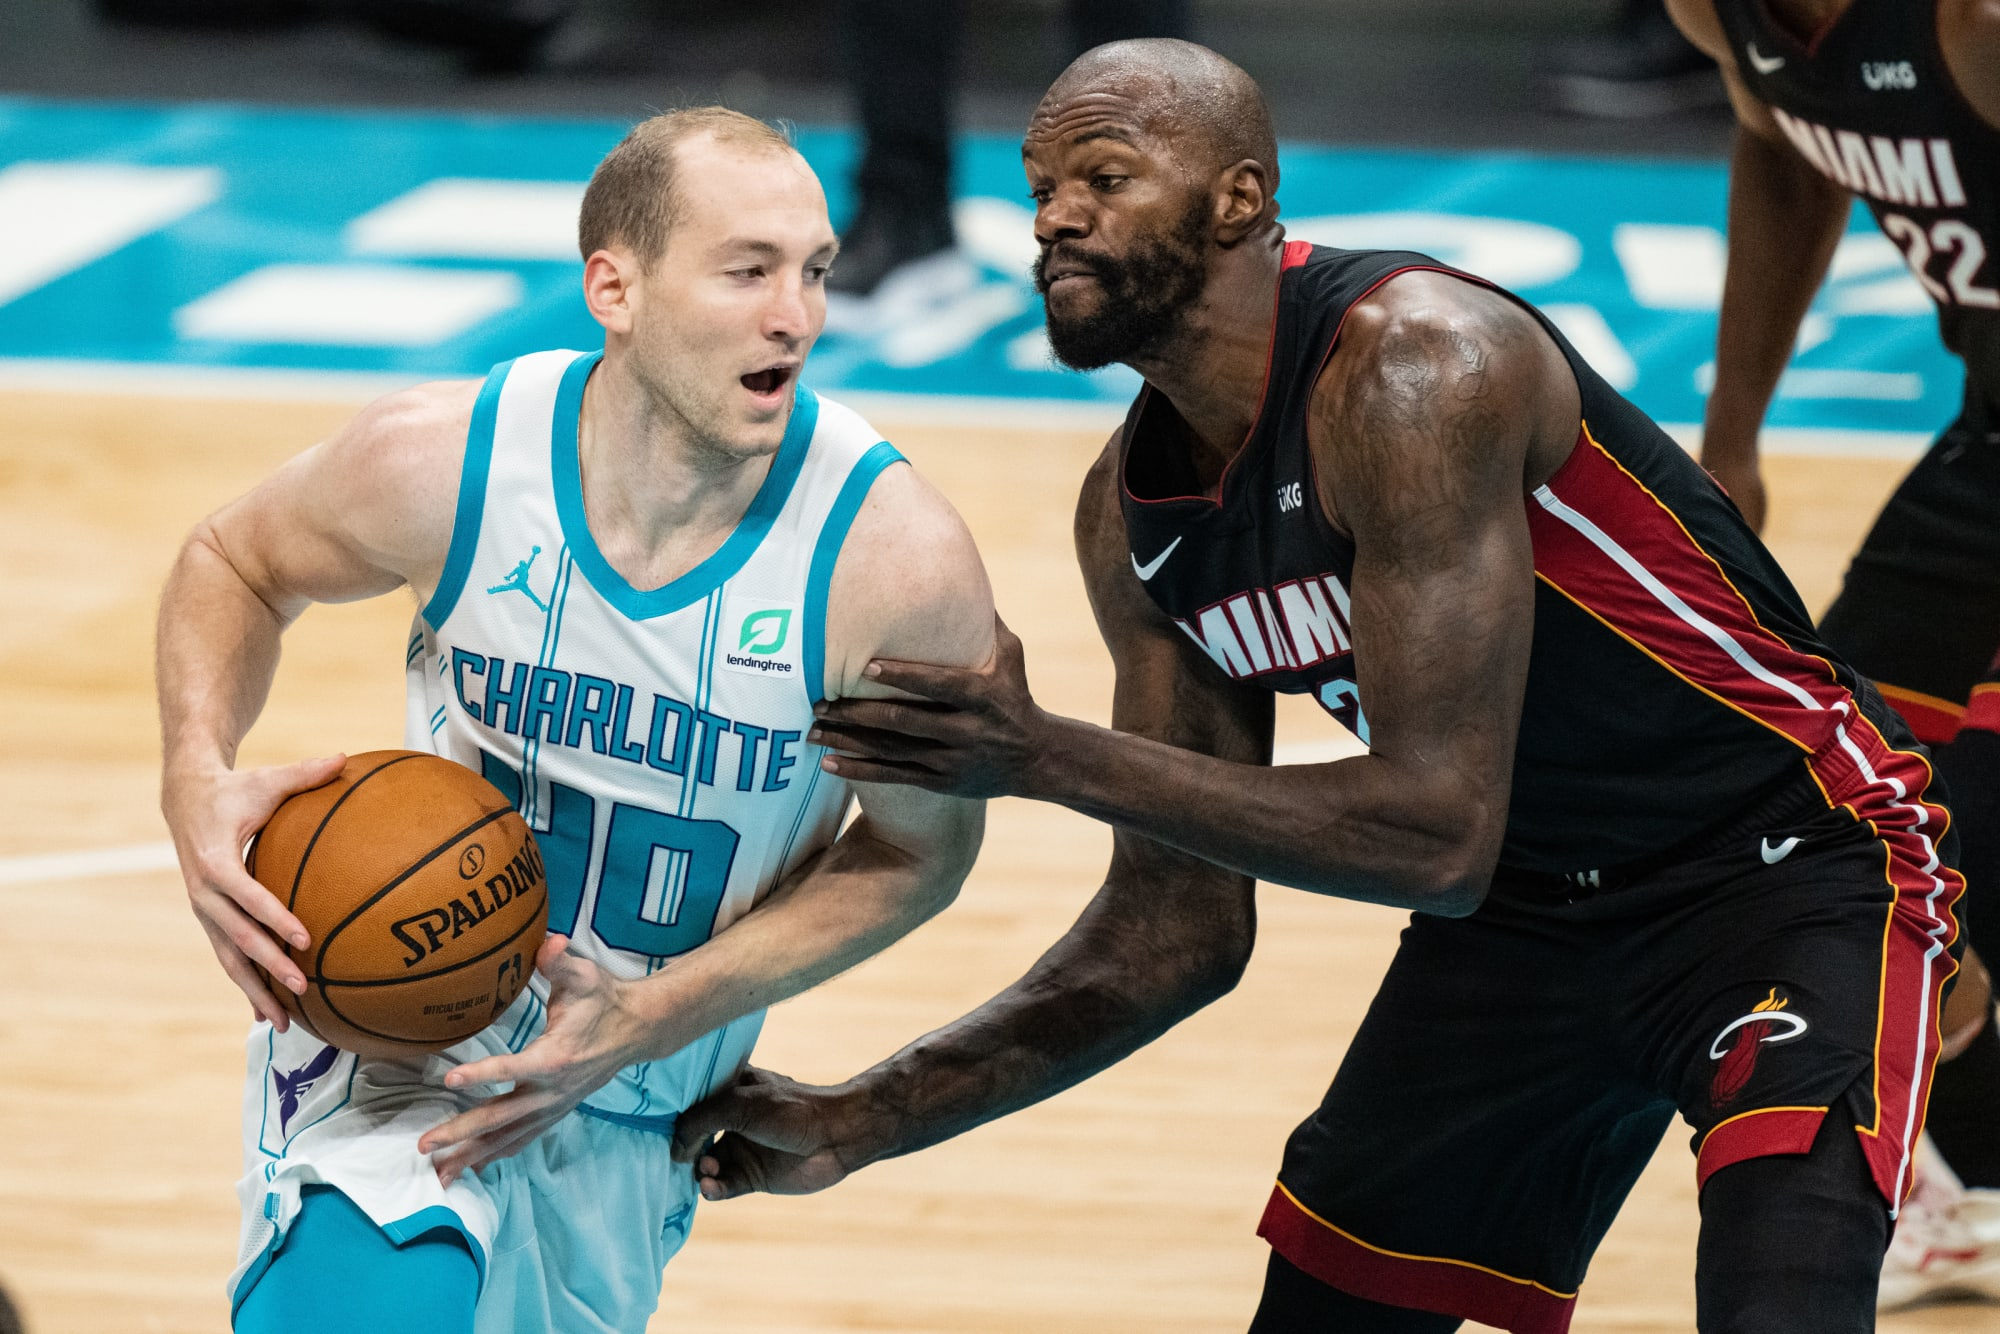 Charlotte Hornets: 3 blockbuster trades for a star big man